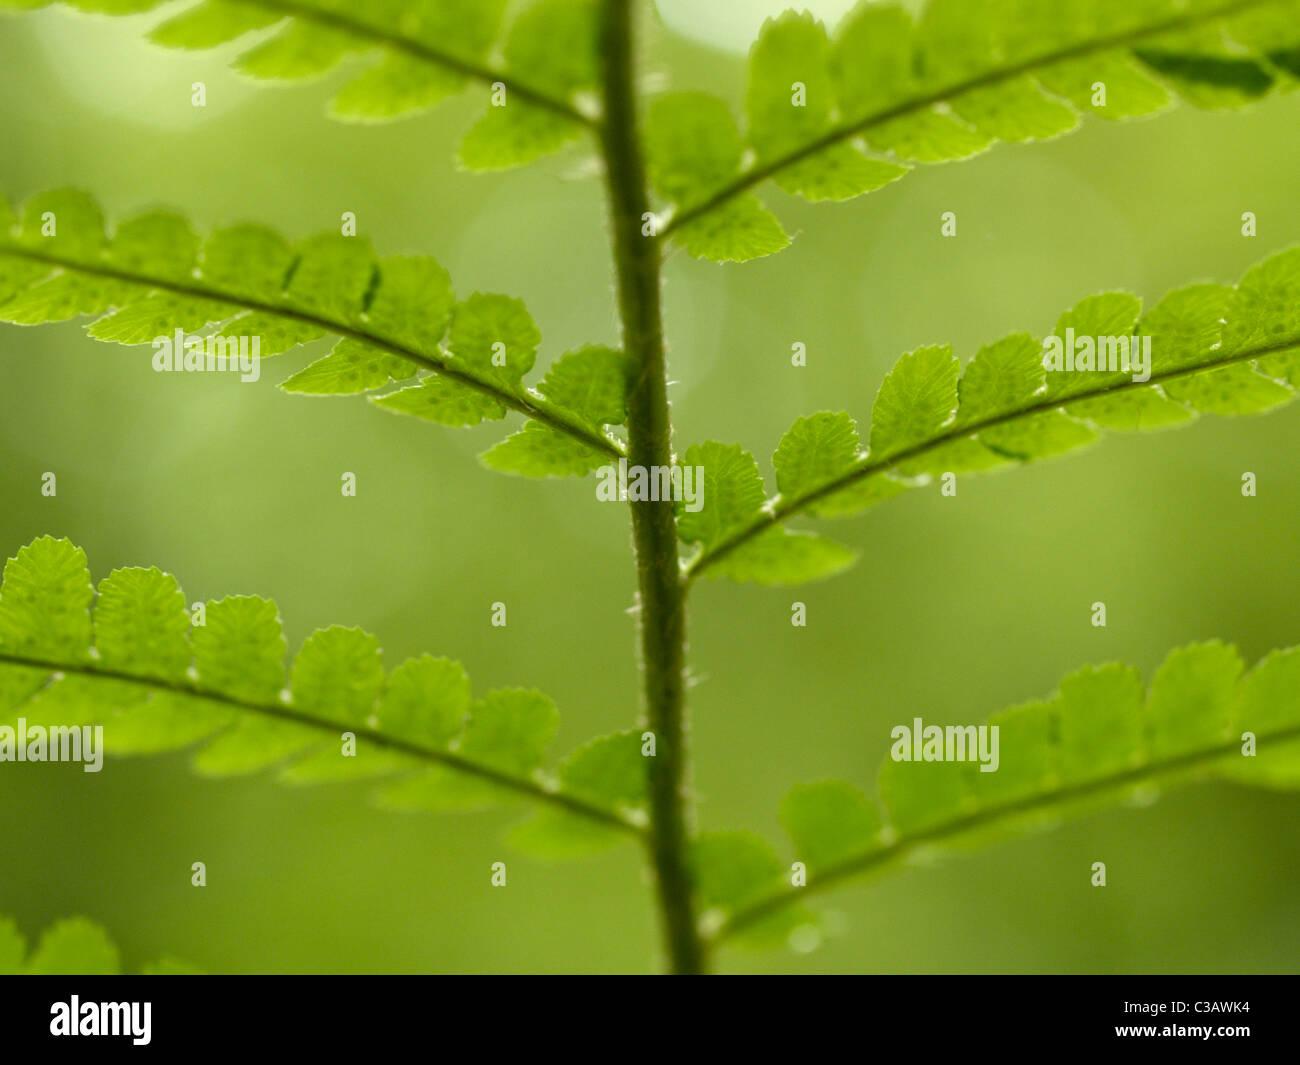 Fern / Pteridophyta branch from below - Stock Image